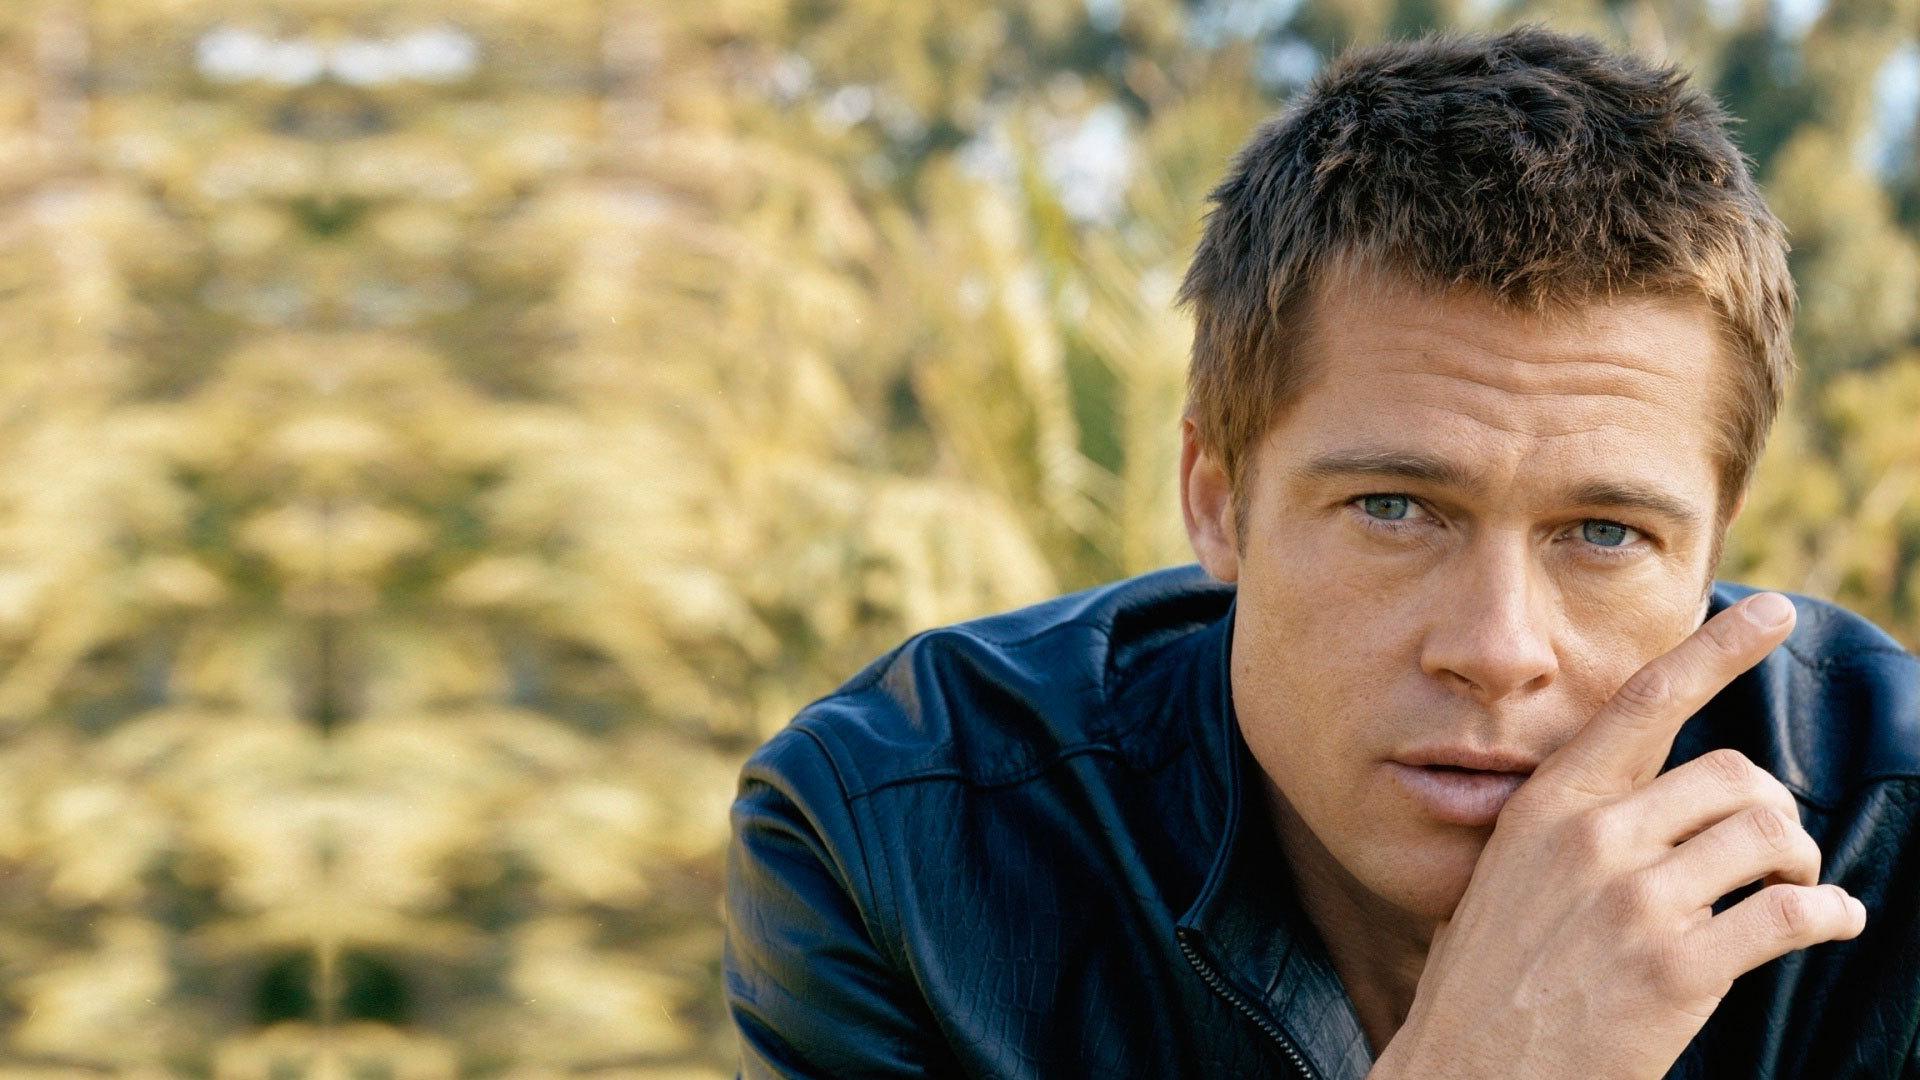 Brad Pitt Hd Wallpapers: Brad Pitt Wallpapers HD